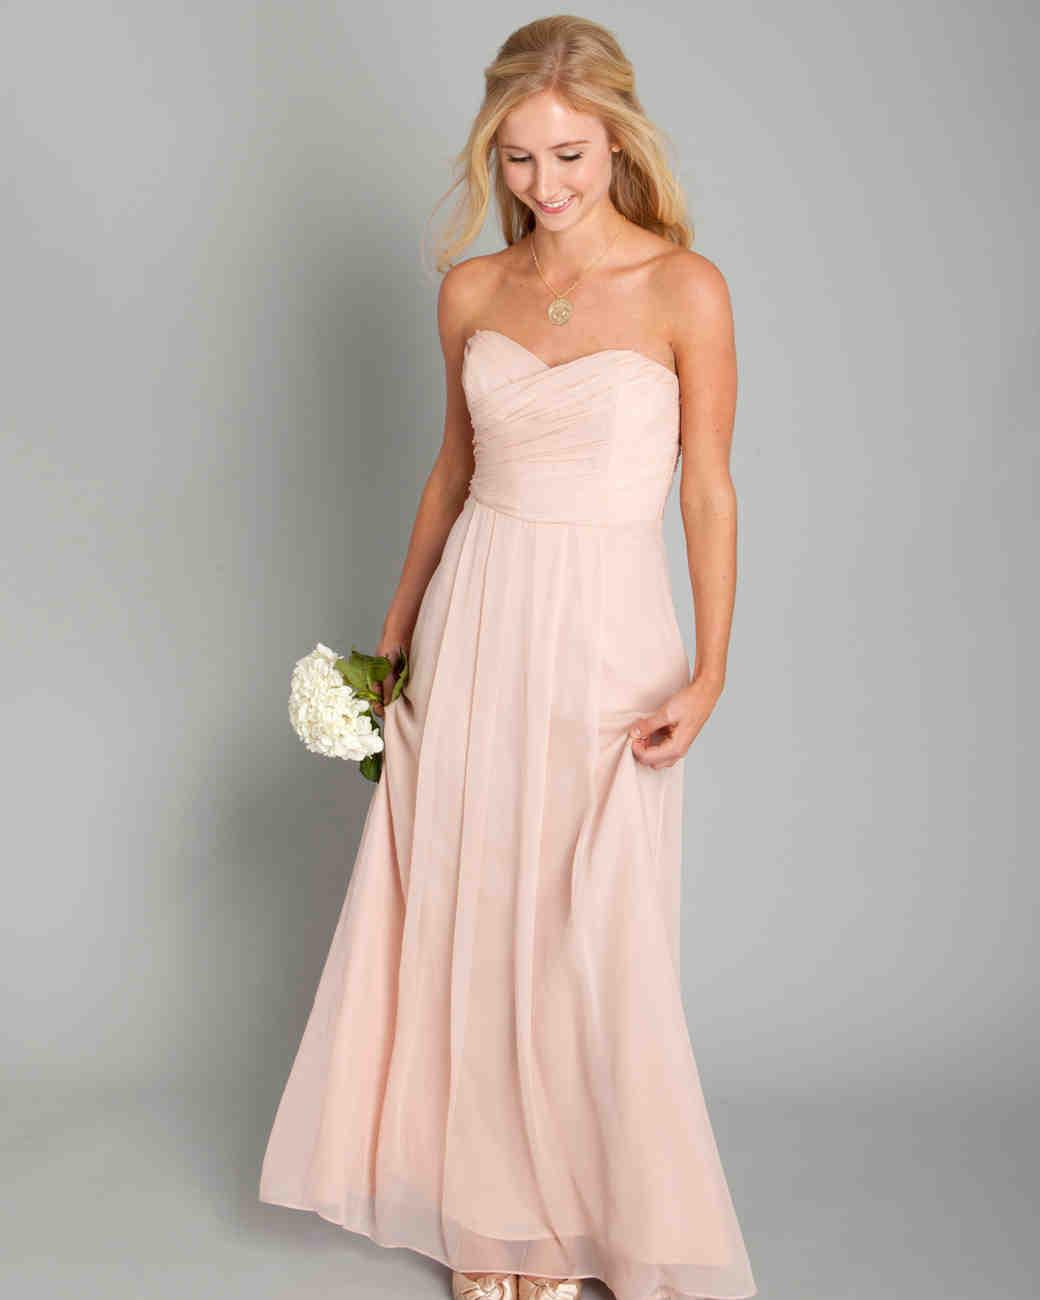 Pink bridesmaid dresses martha stewart weddings photography courtesy coren moore ombrellifo Image collections